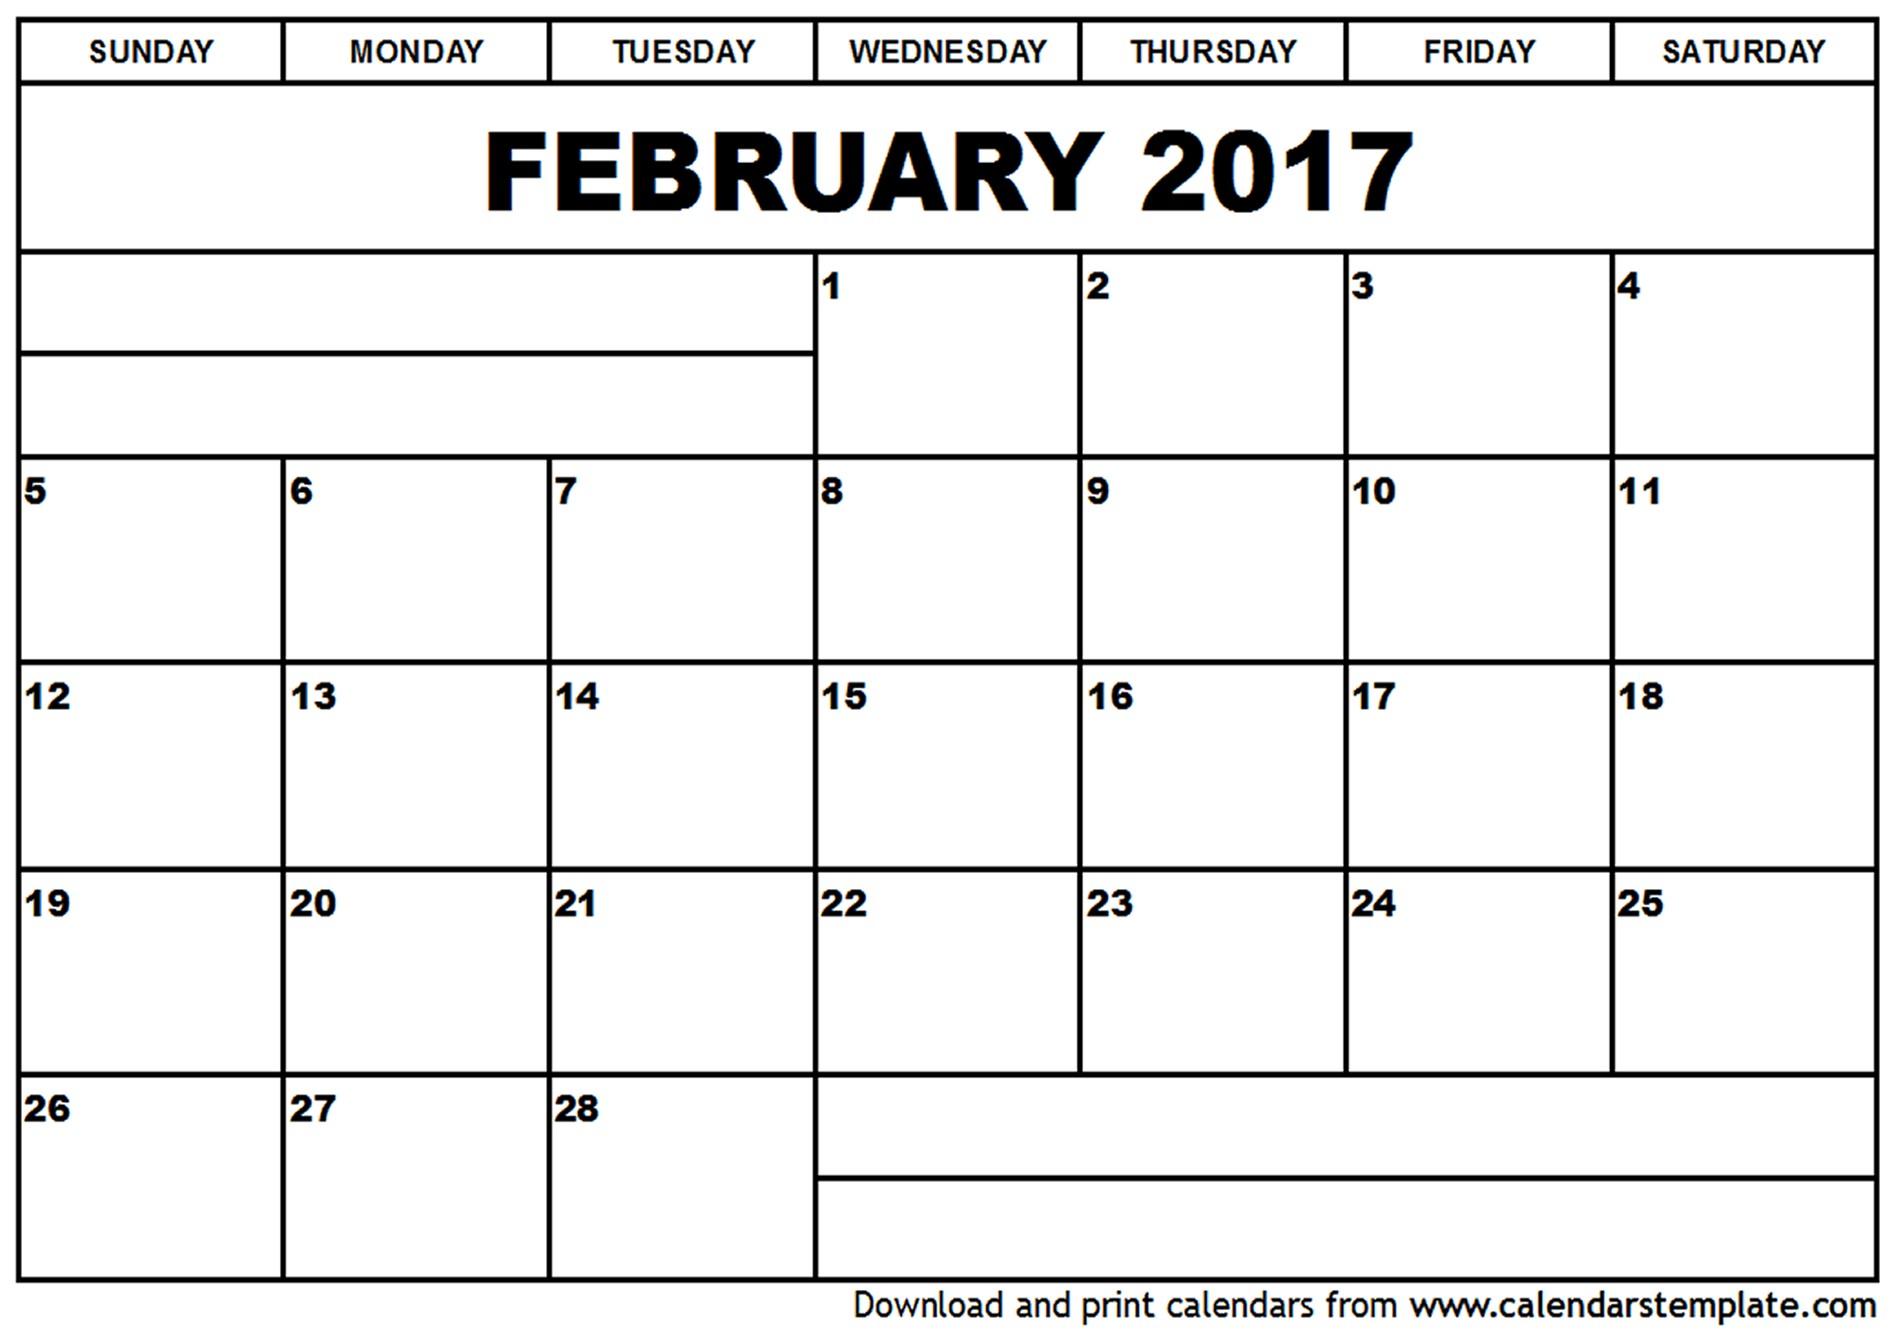 February 2017 Calendar Template